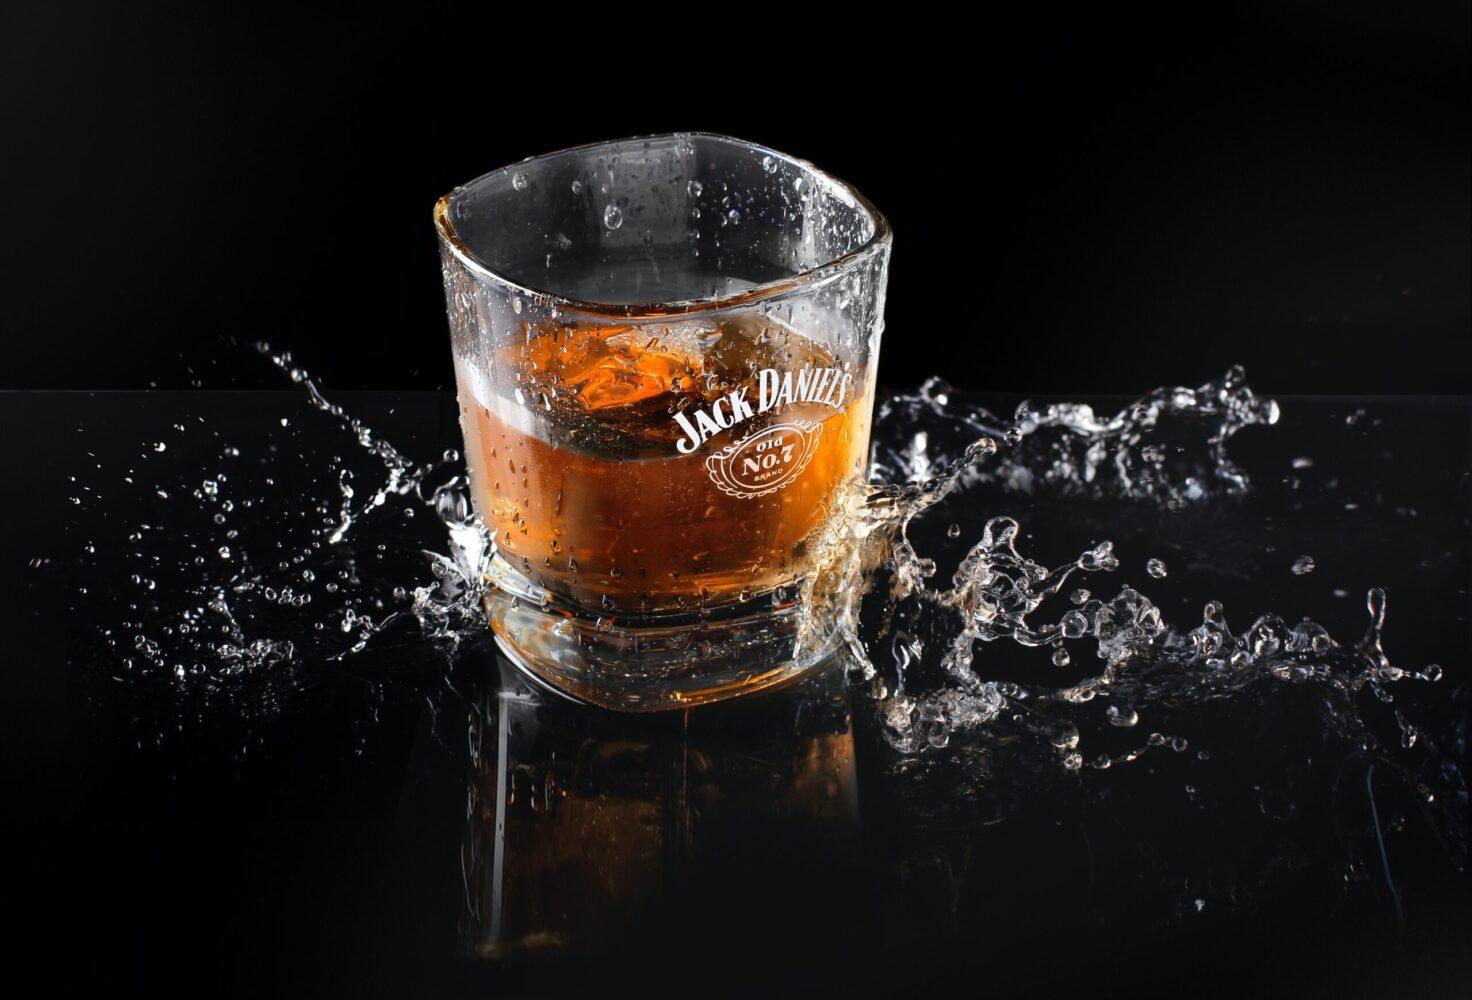 Het Gezinsleven - Lifestyle - Mannen - 8 verschillende soorten whisky - Glas Jack Daniels